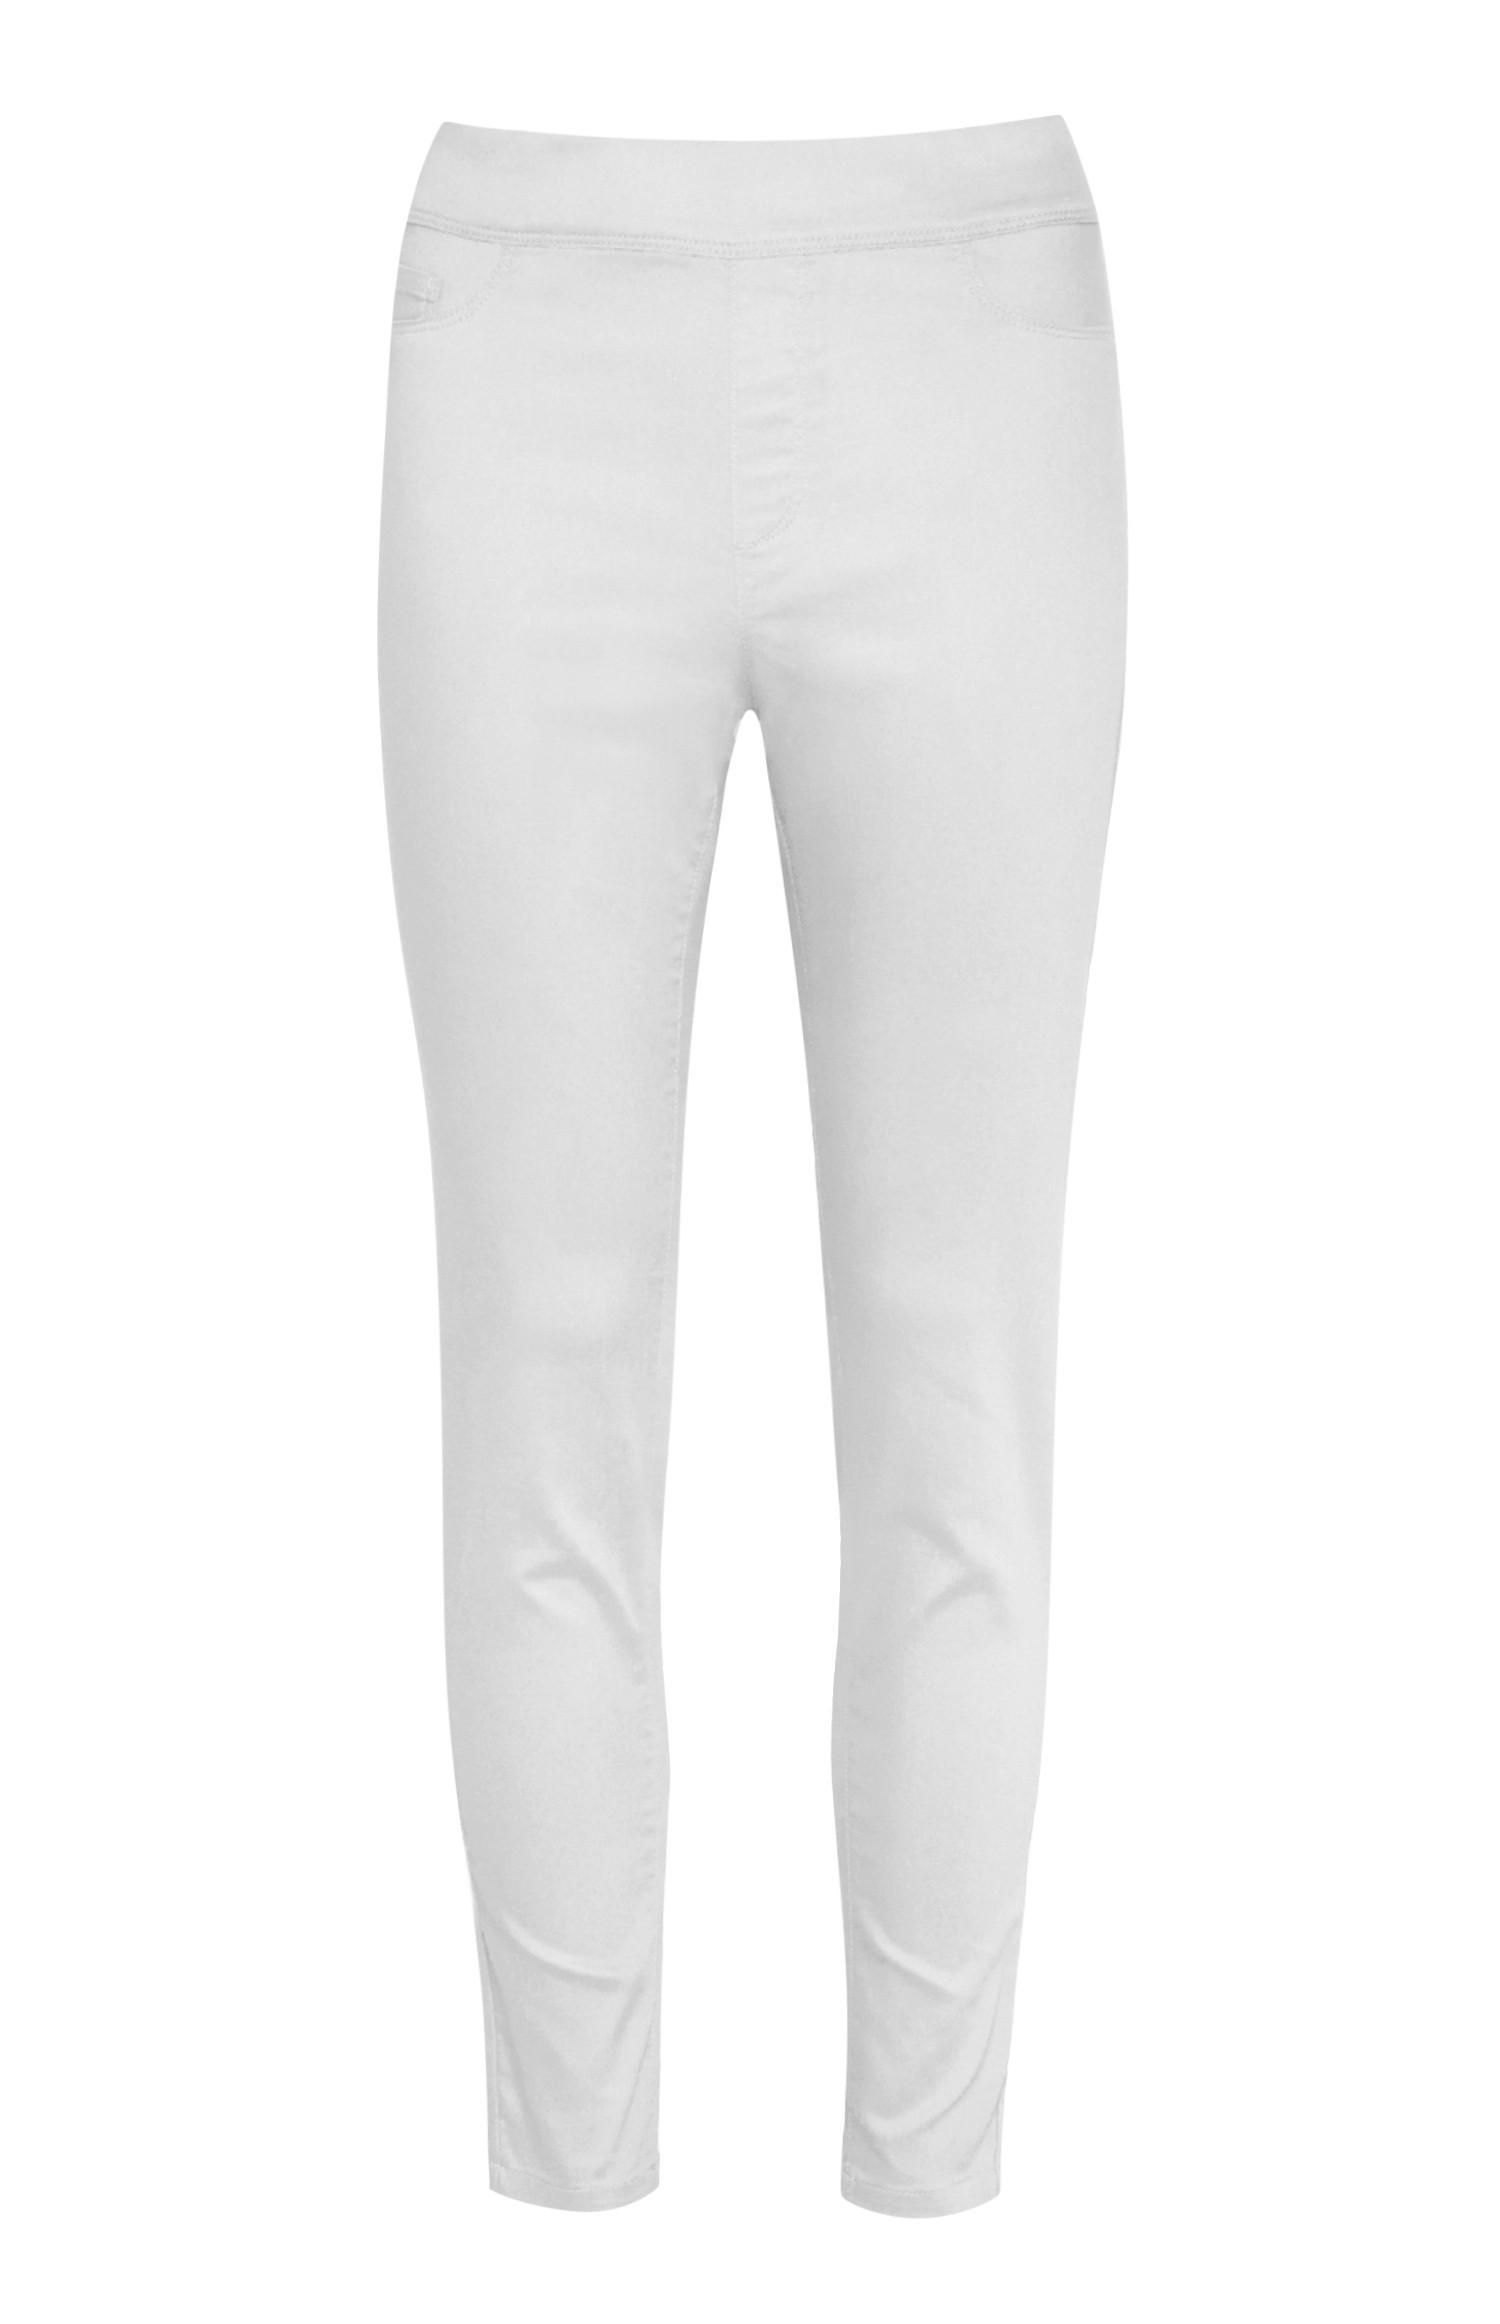 Leggings brancos